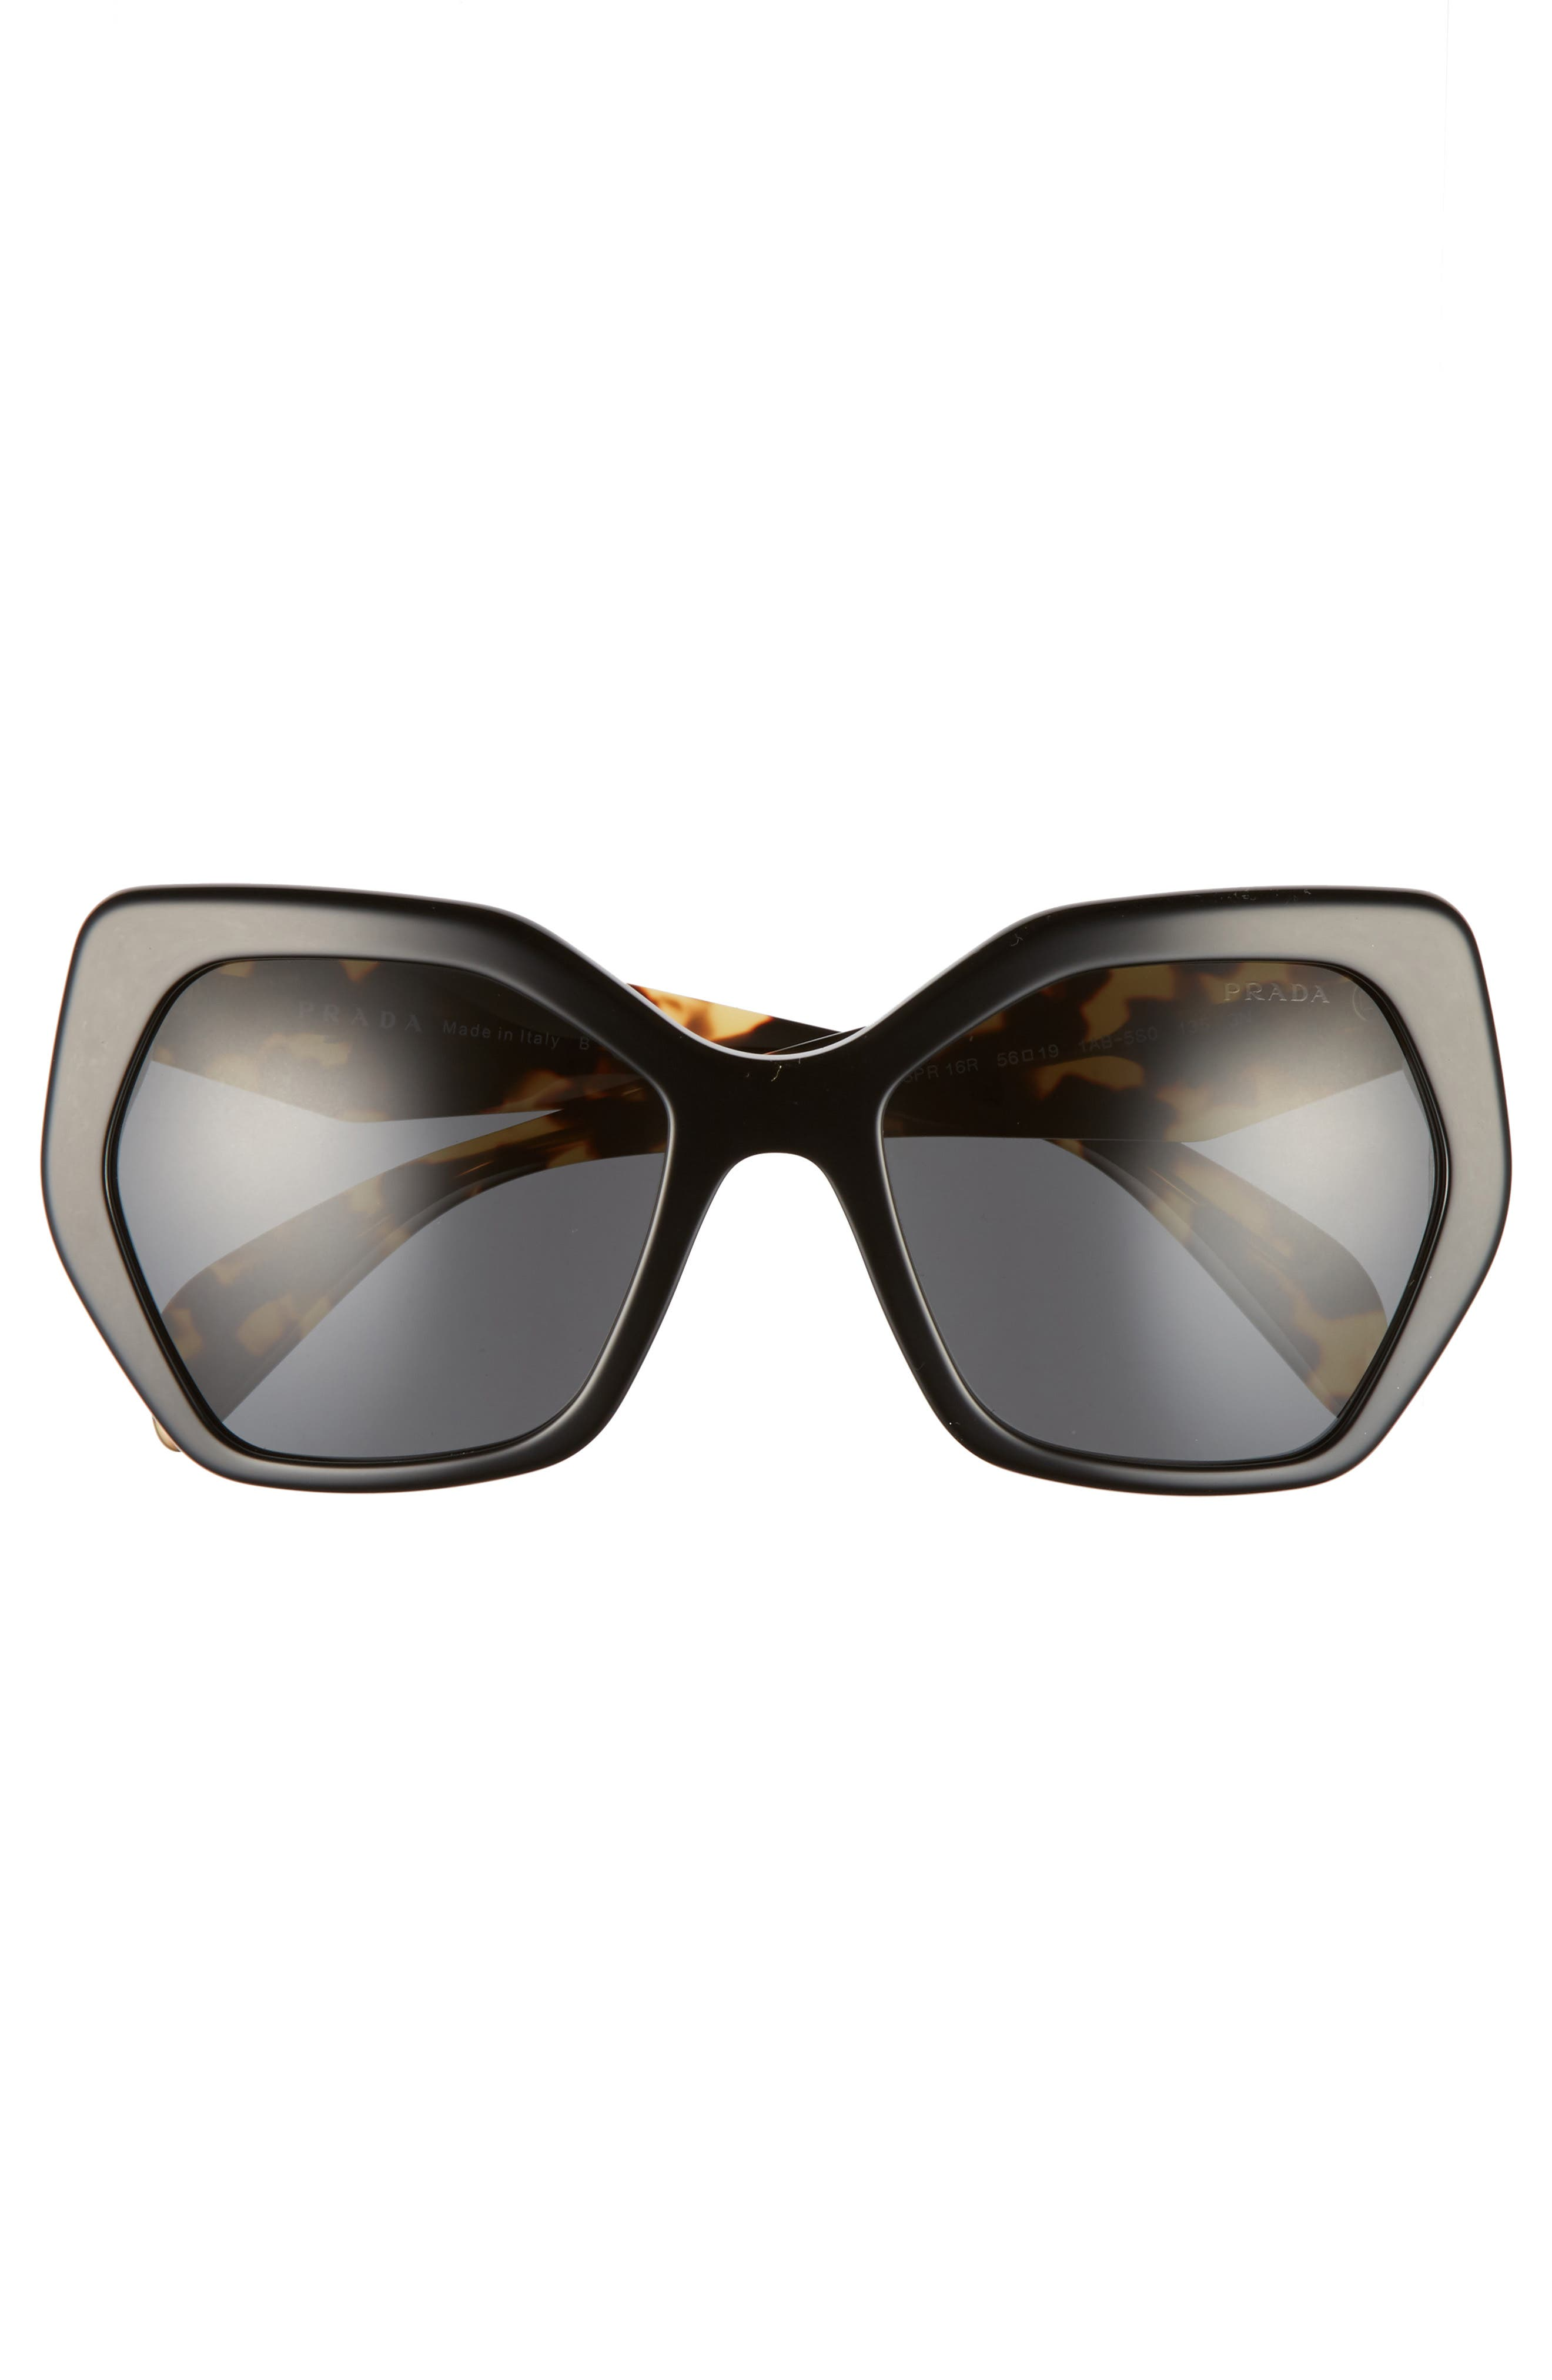 Heritage 56mm Sunglasses,                             Alternate thumbnail 3, color,                             002